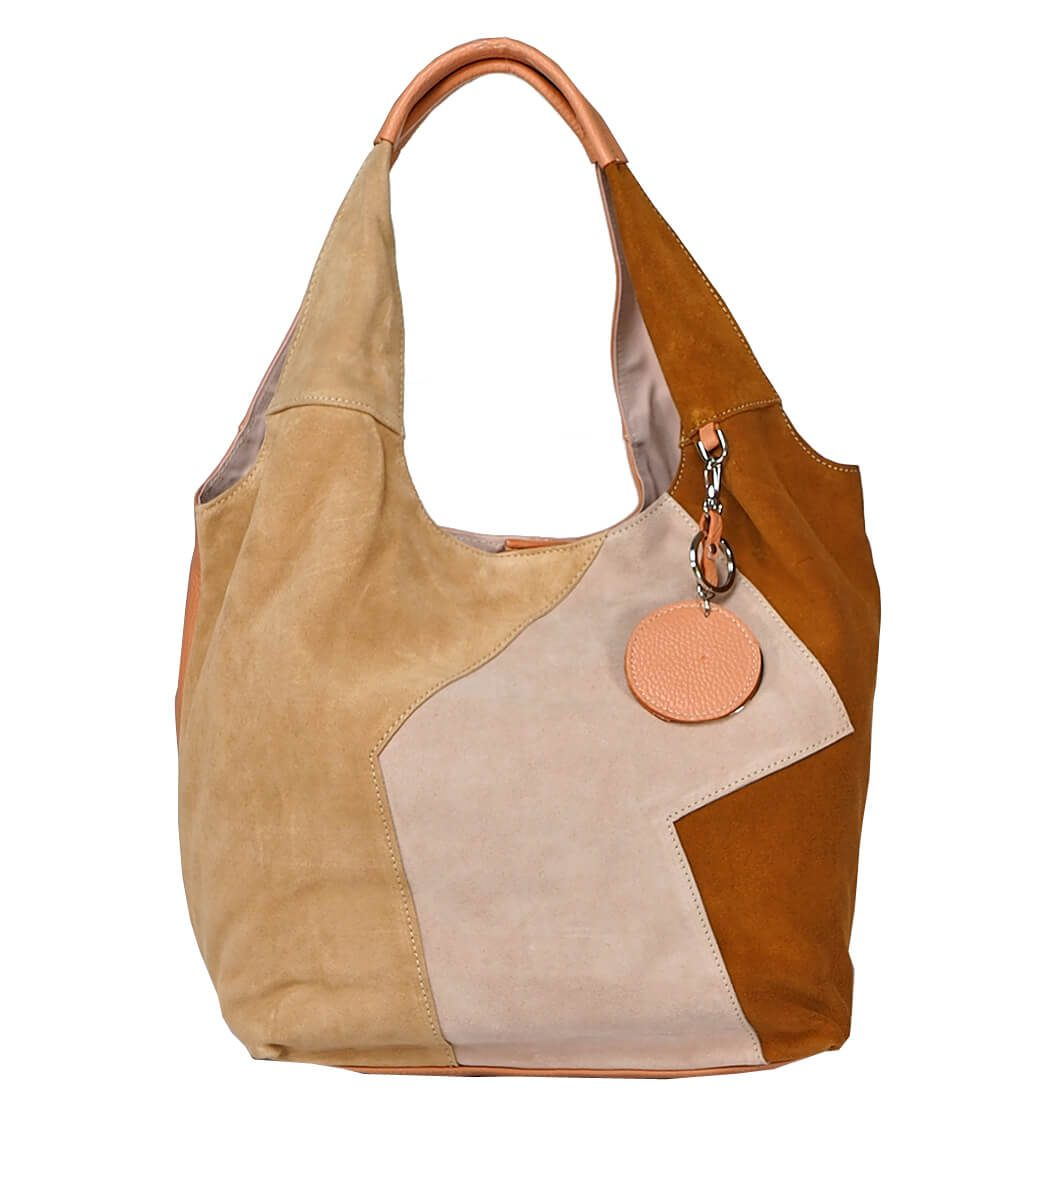 a0e2f7ef0492 Women's Handbag INNUE' - brown- MyFashionStore.eu